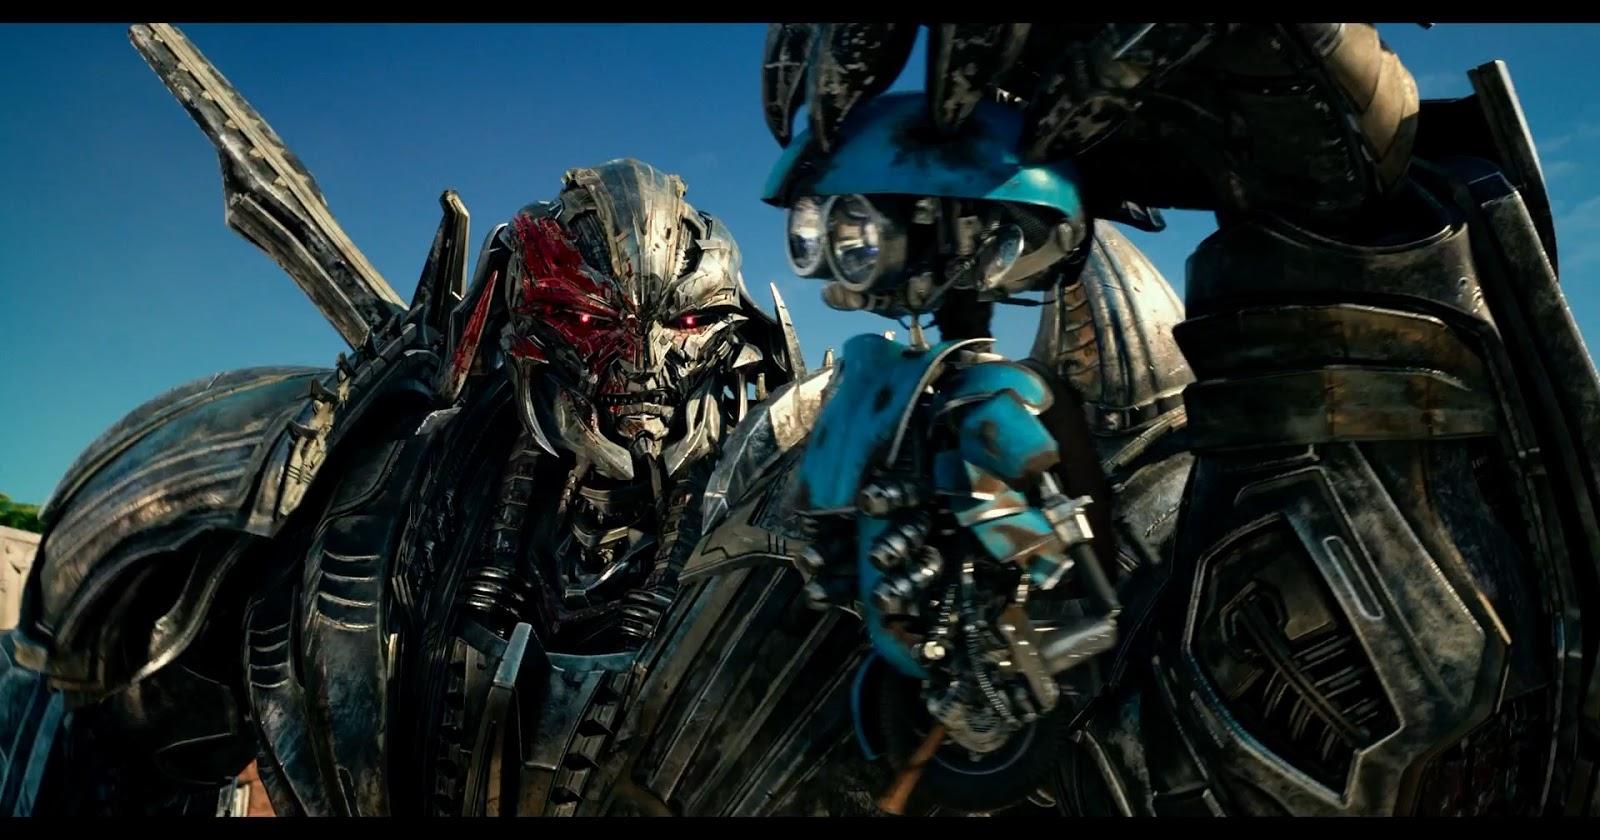 Transformers The Last Knight BRRip IMAX 1080p x264 Dual Áudio 5 1 2017 ByPHSL555